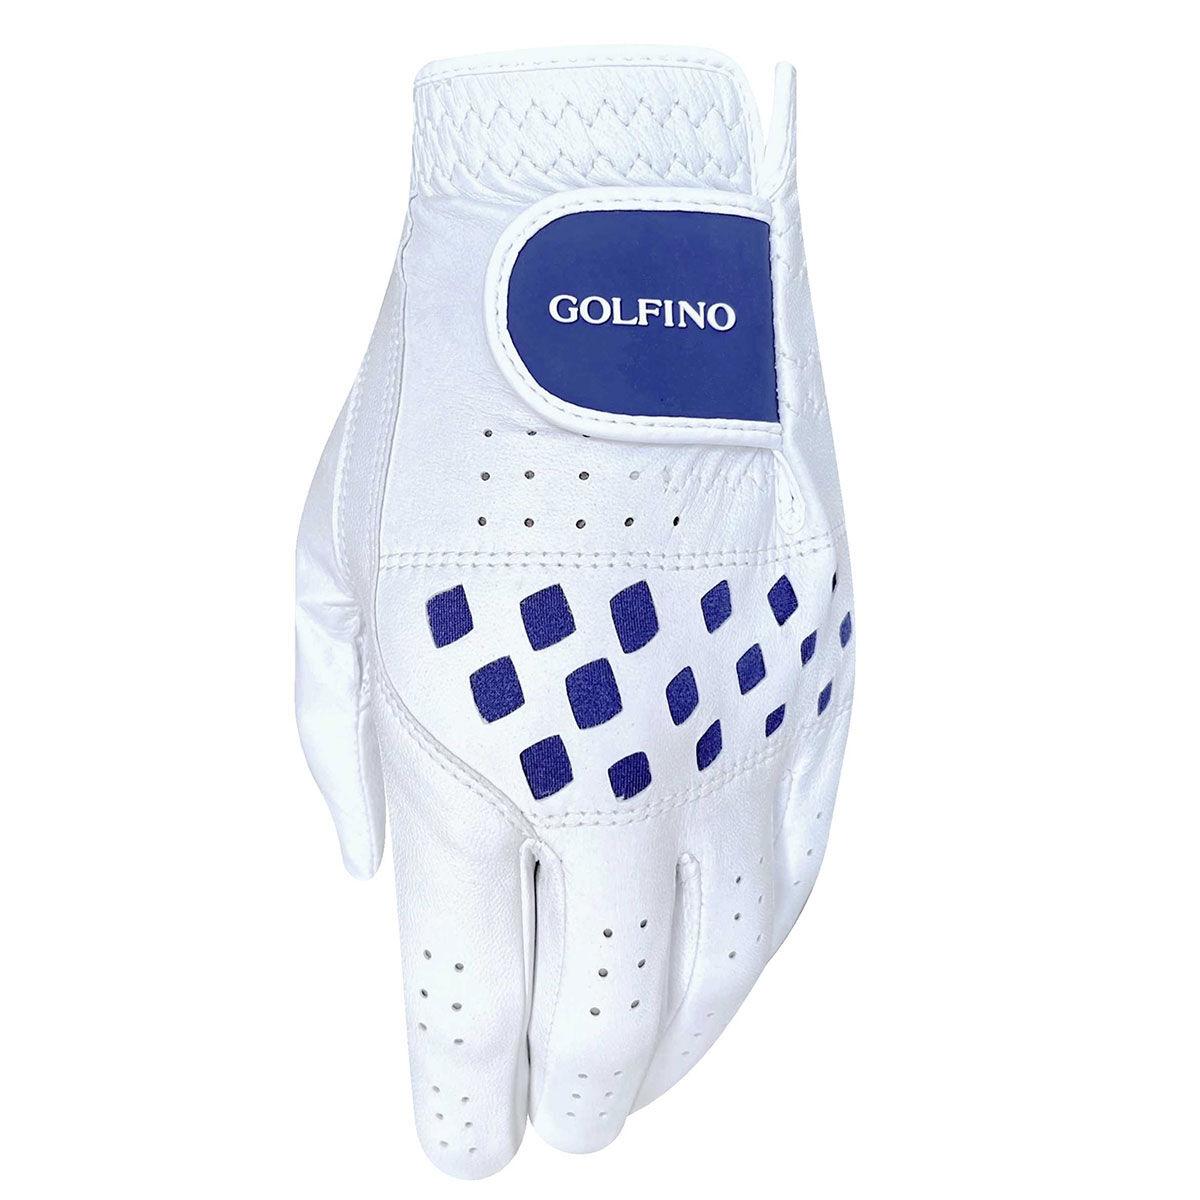 GOLFINO Cabretta Leather Womens Golf Glove, Female, Left hand, Large, White/navy | American Golf